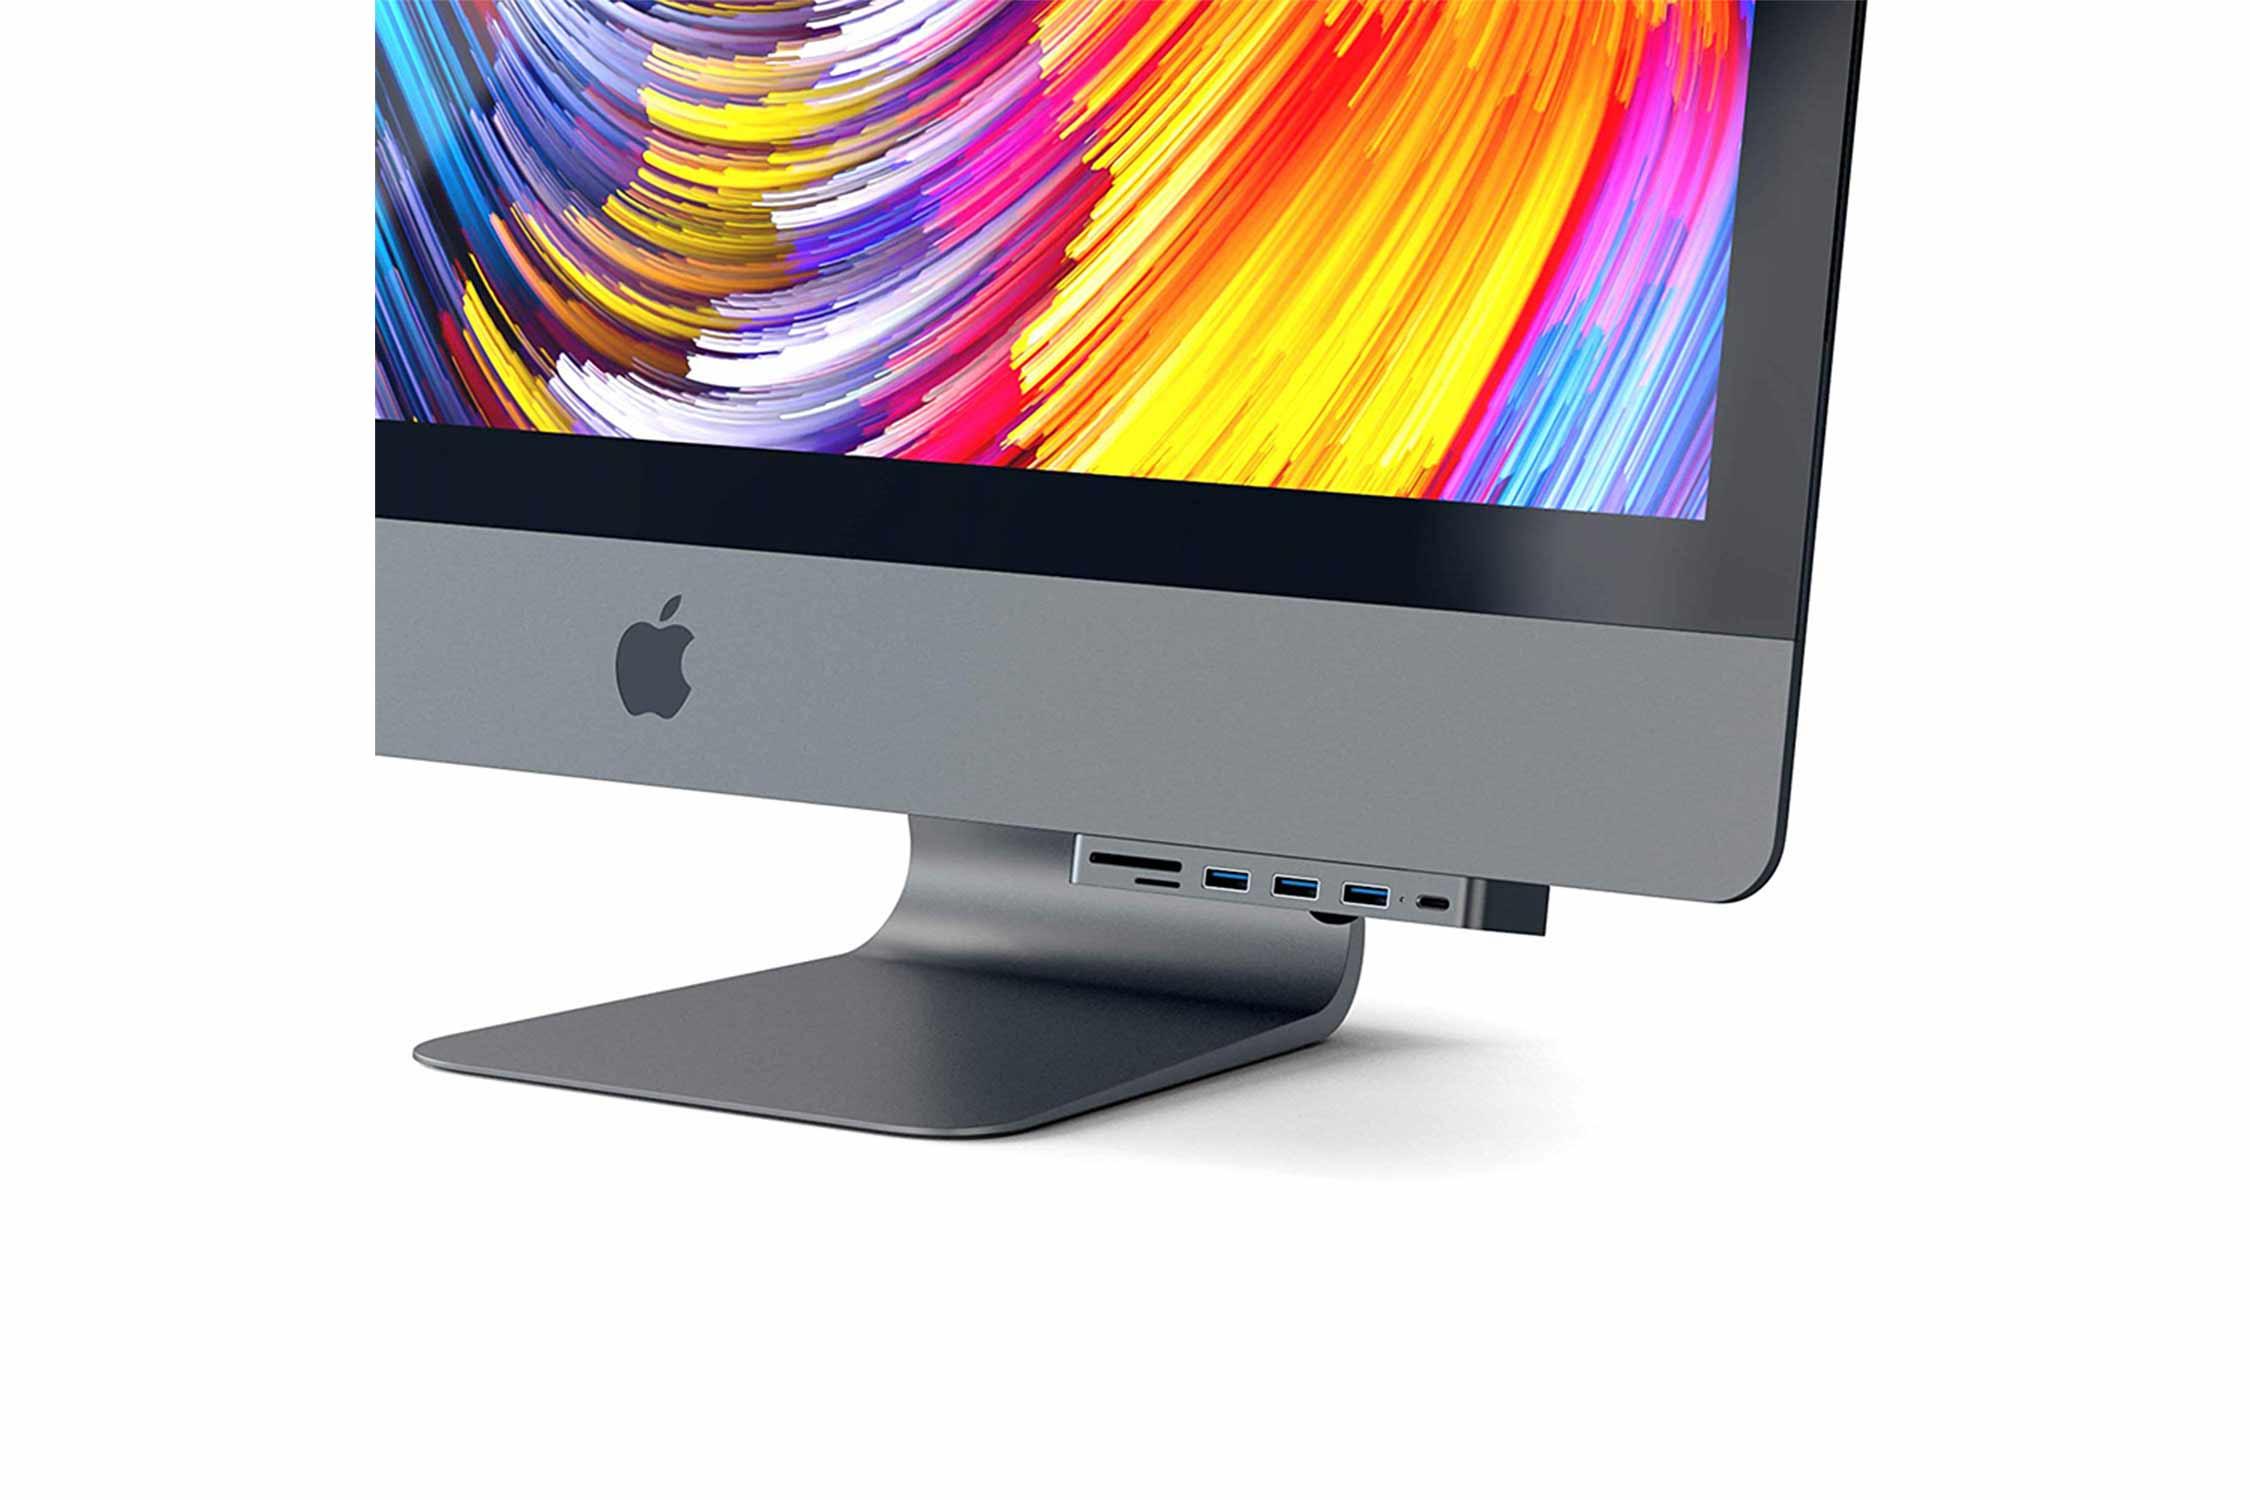 iMac ProのUSB Type-C カードリーダー